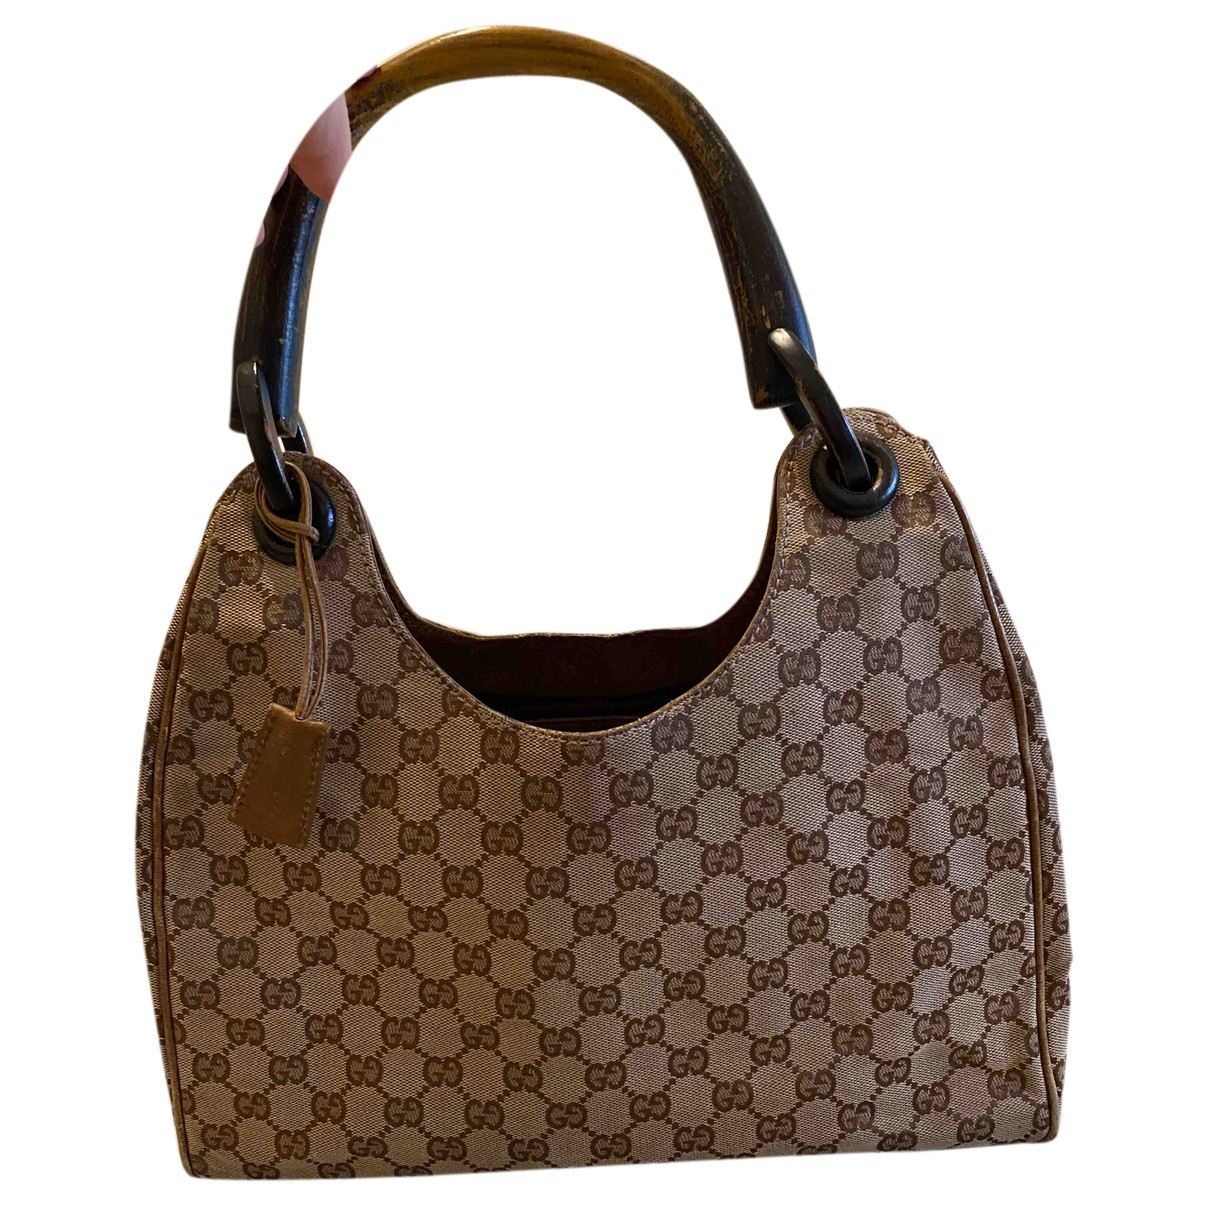 Gucci N Beige Cotton handbag for Women N